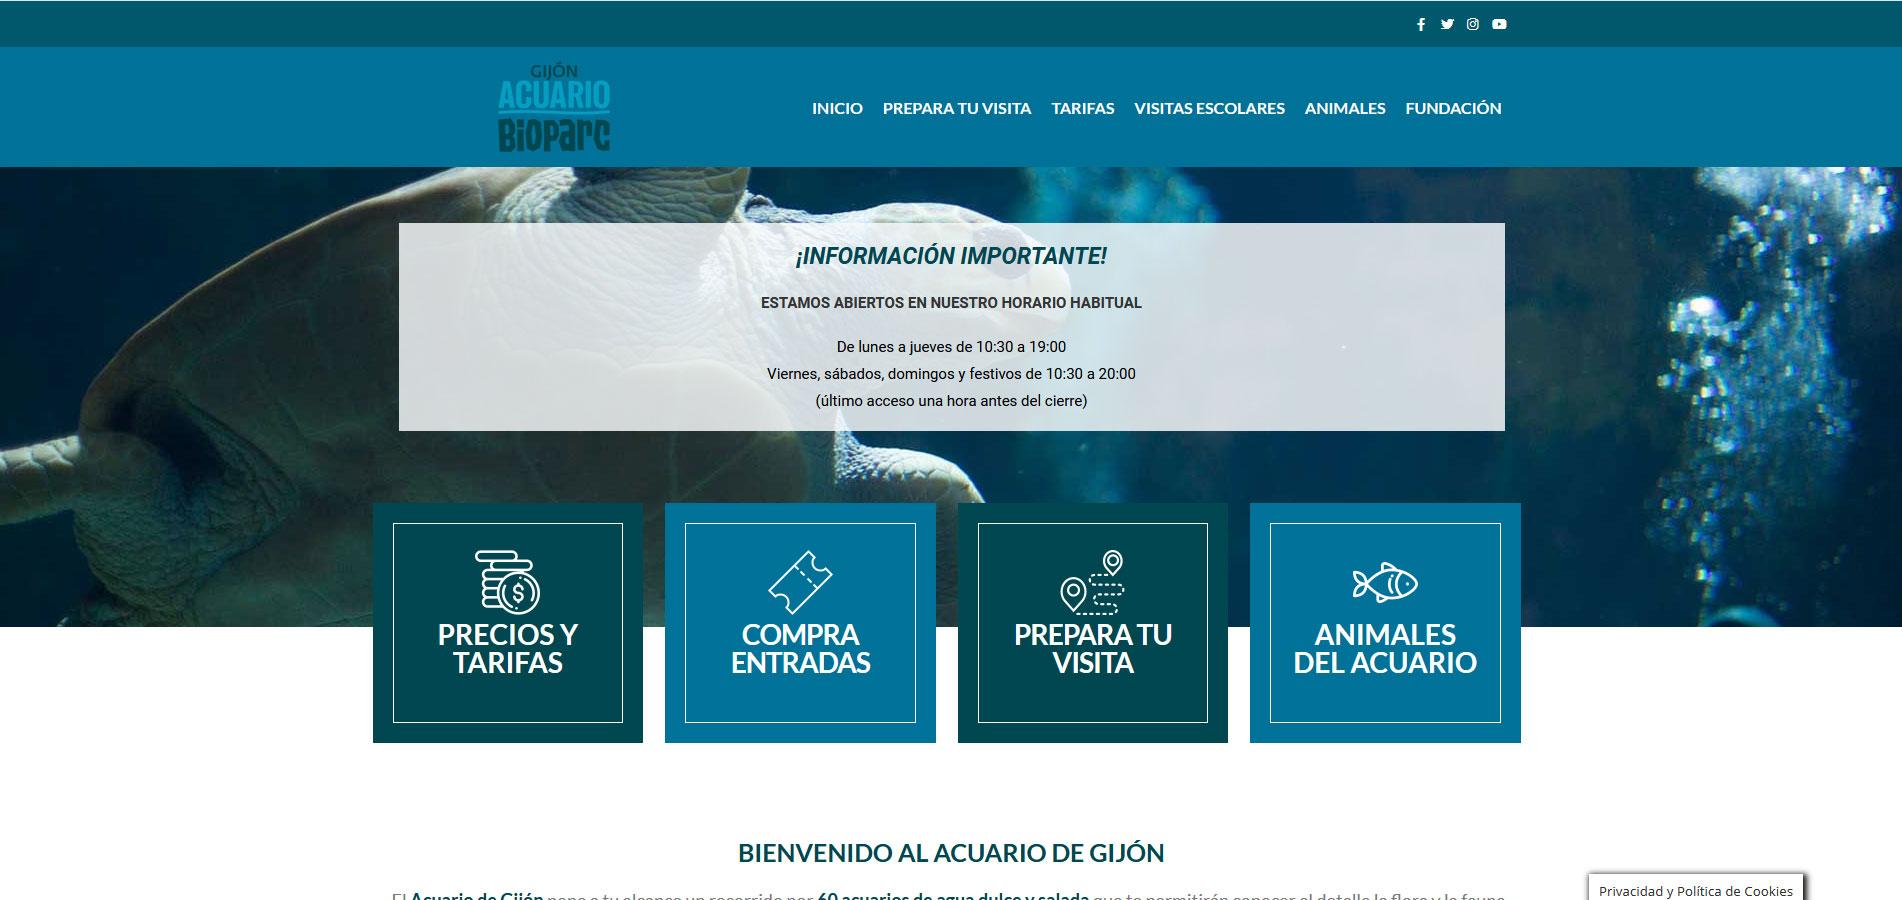 acuario-gijon-mantenimiento-1